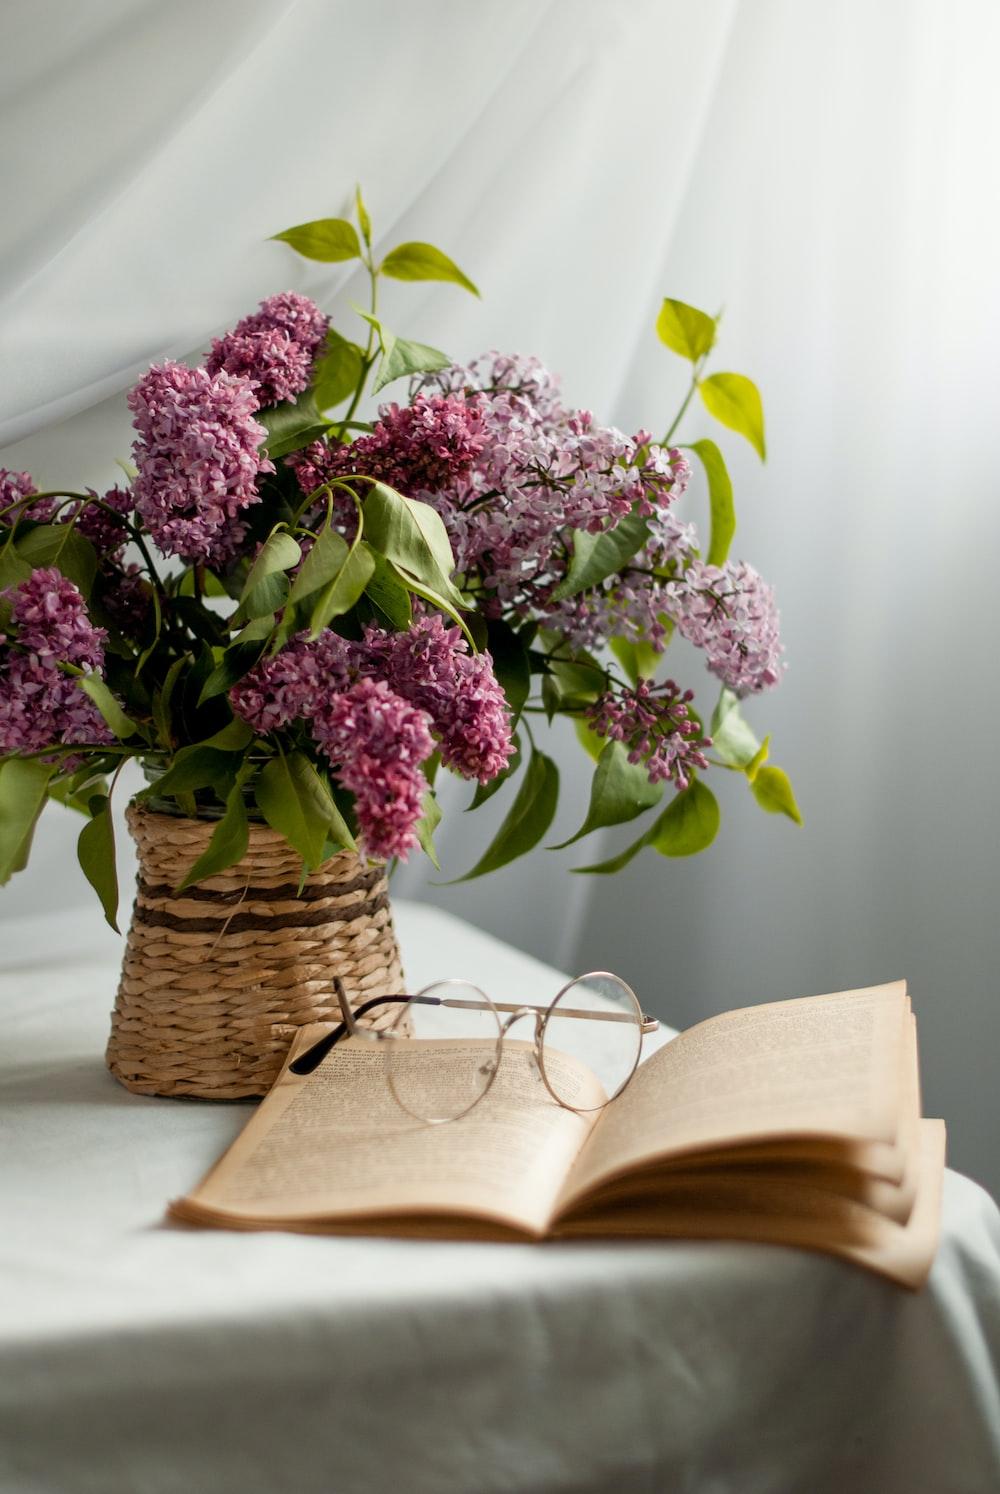 purple flowers on brown woven basket